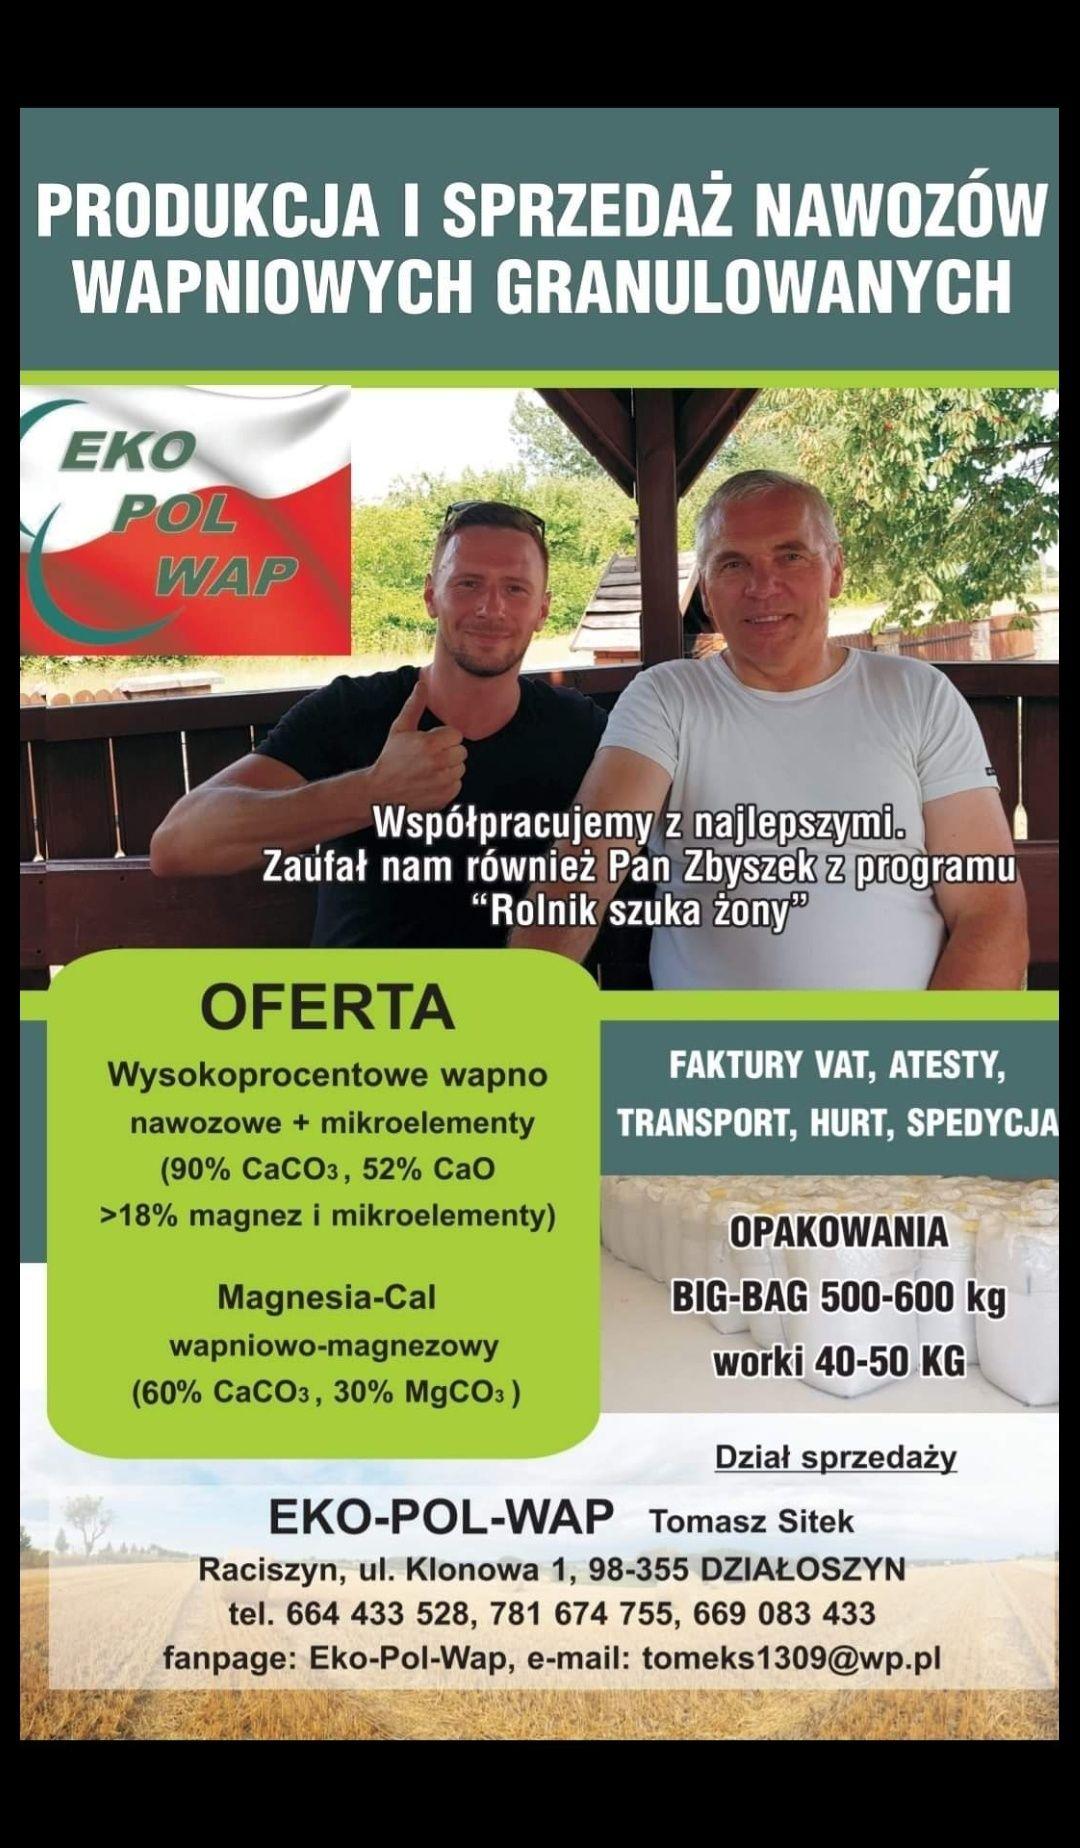 WAPNO granulowane PRODUCENT magnezowe kreda Faktura Dostawa gratis!Eko